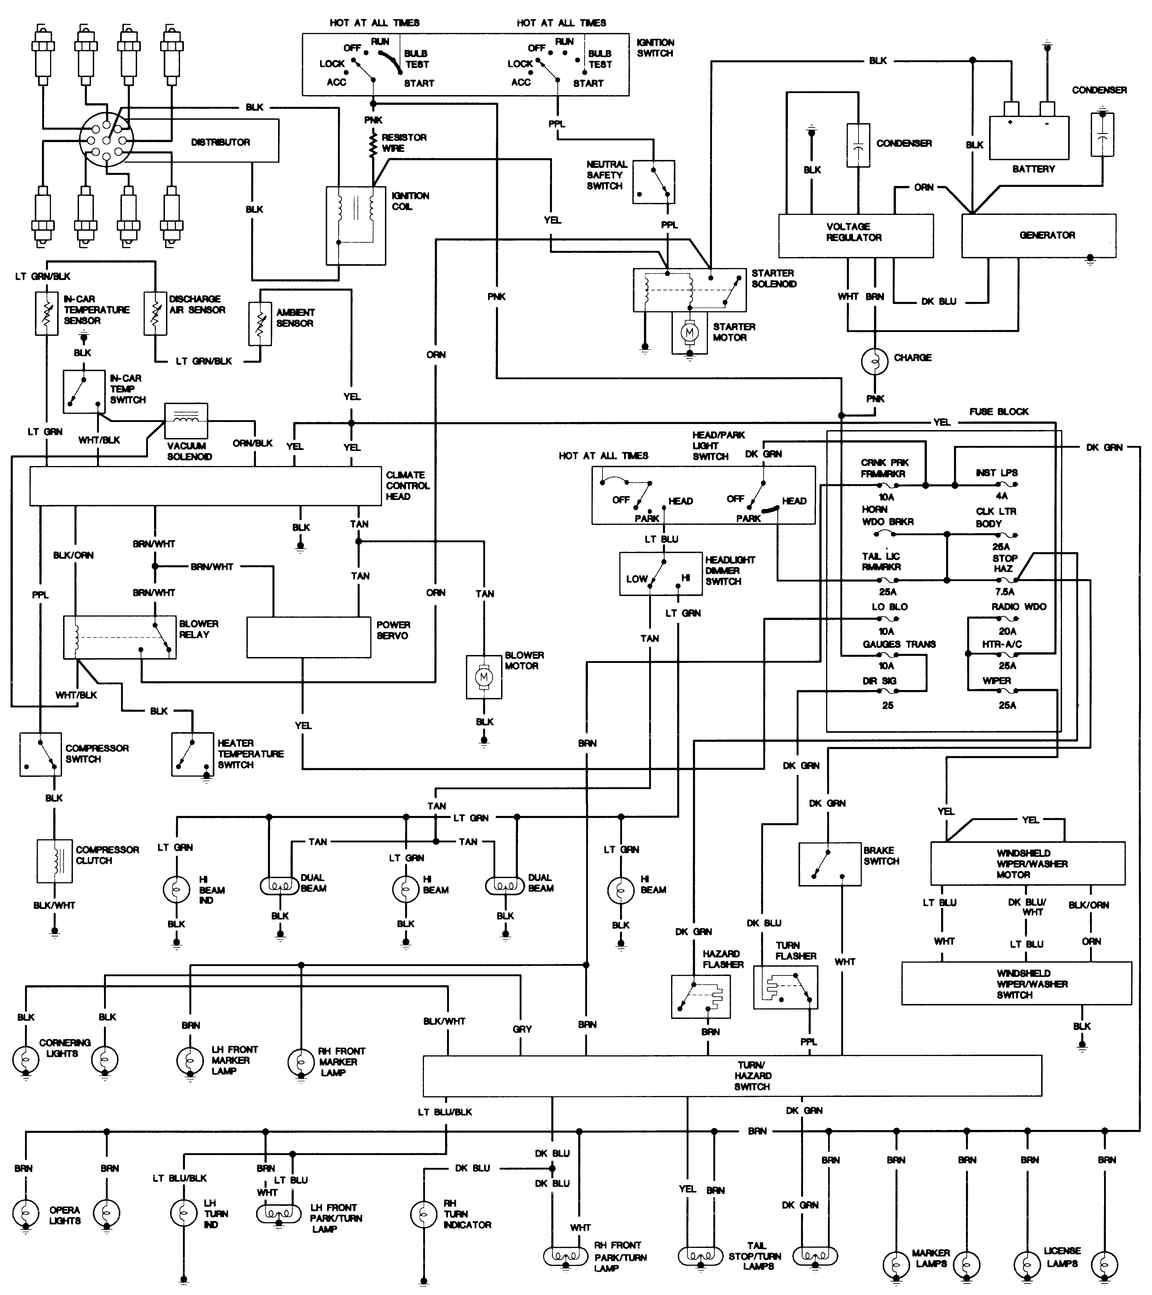 [DIAGRAM_38EU]  OZ_7444] 1969 Cadillac Wiring Diagram Free Diagram   Free Cadillac Wiring Diagrams      Spoat Jebrp Proe Hendil Mohammedshrine Librar Wiring 101